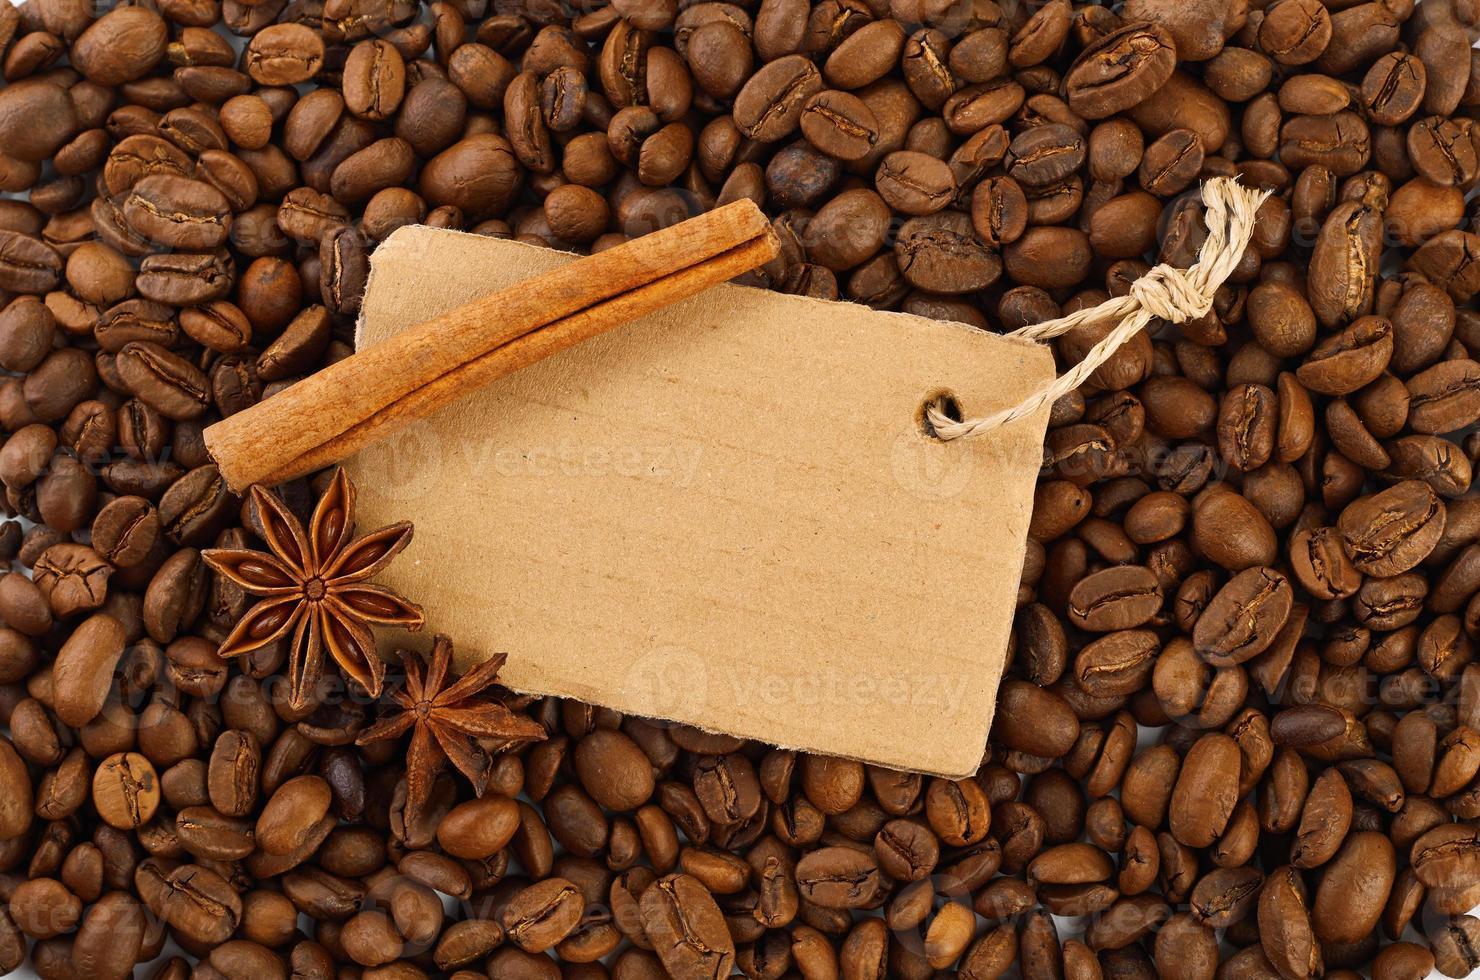 koffie en blanco foto